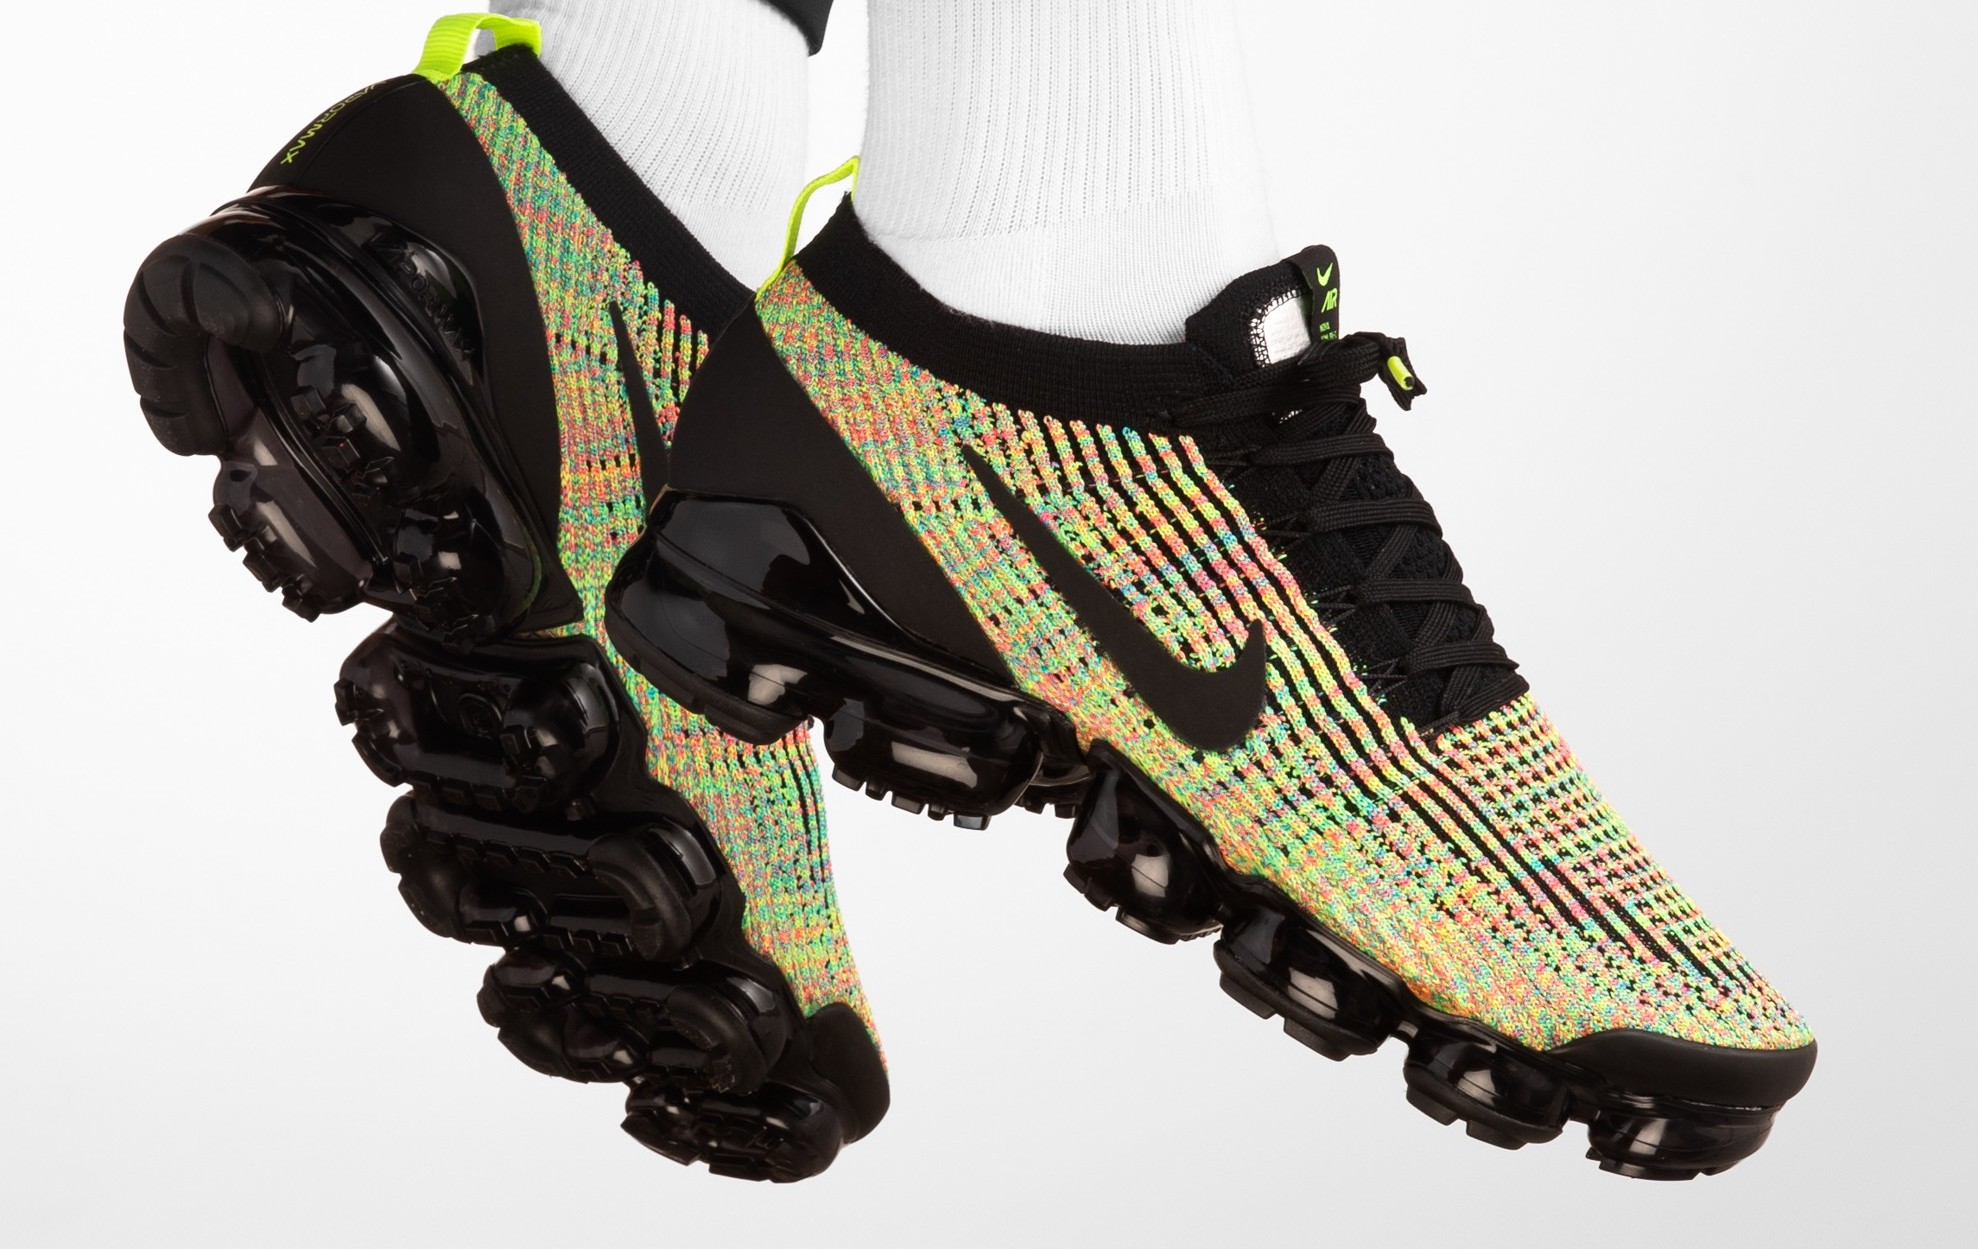 promo code 627ca c7838 Shop The Nike Air VaporMax 3 Multicolor Here • KicksOnFire.com